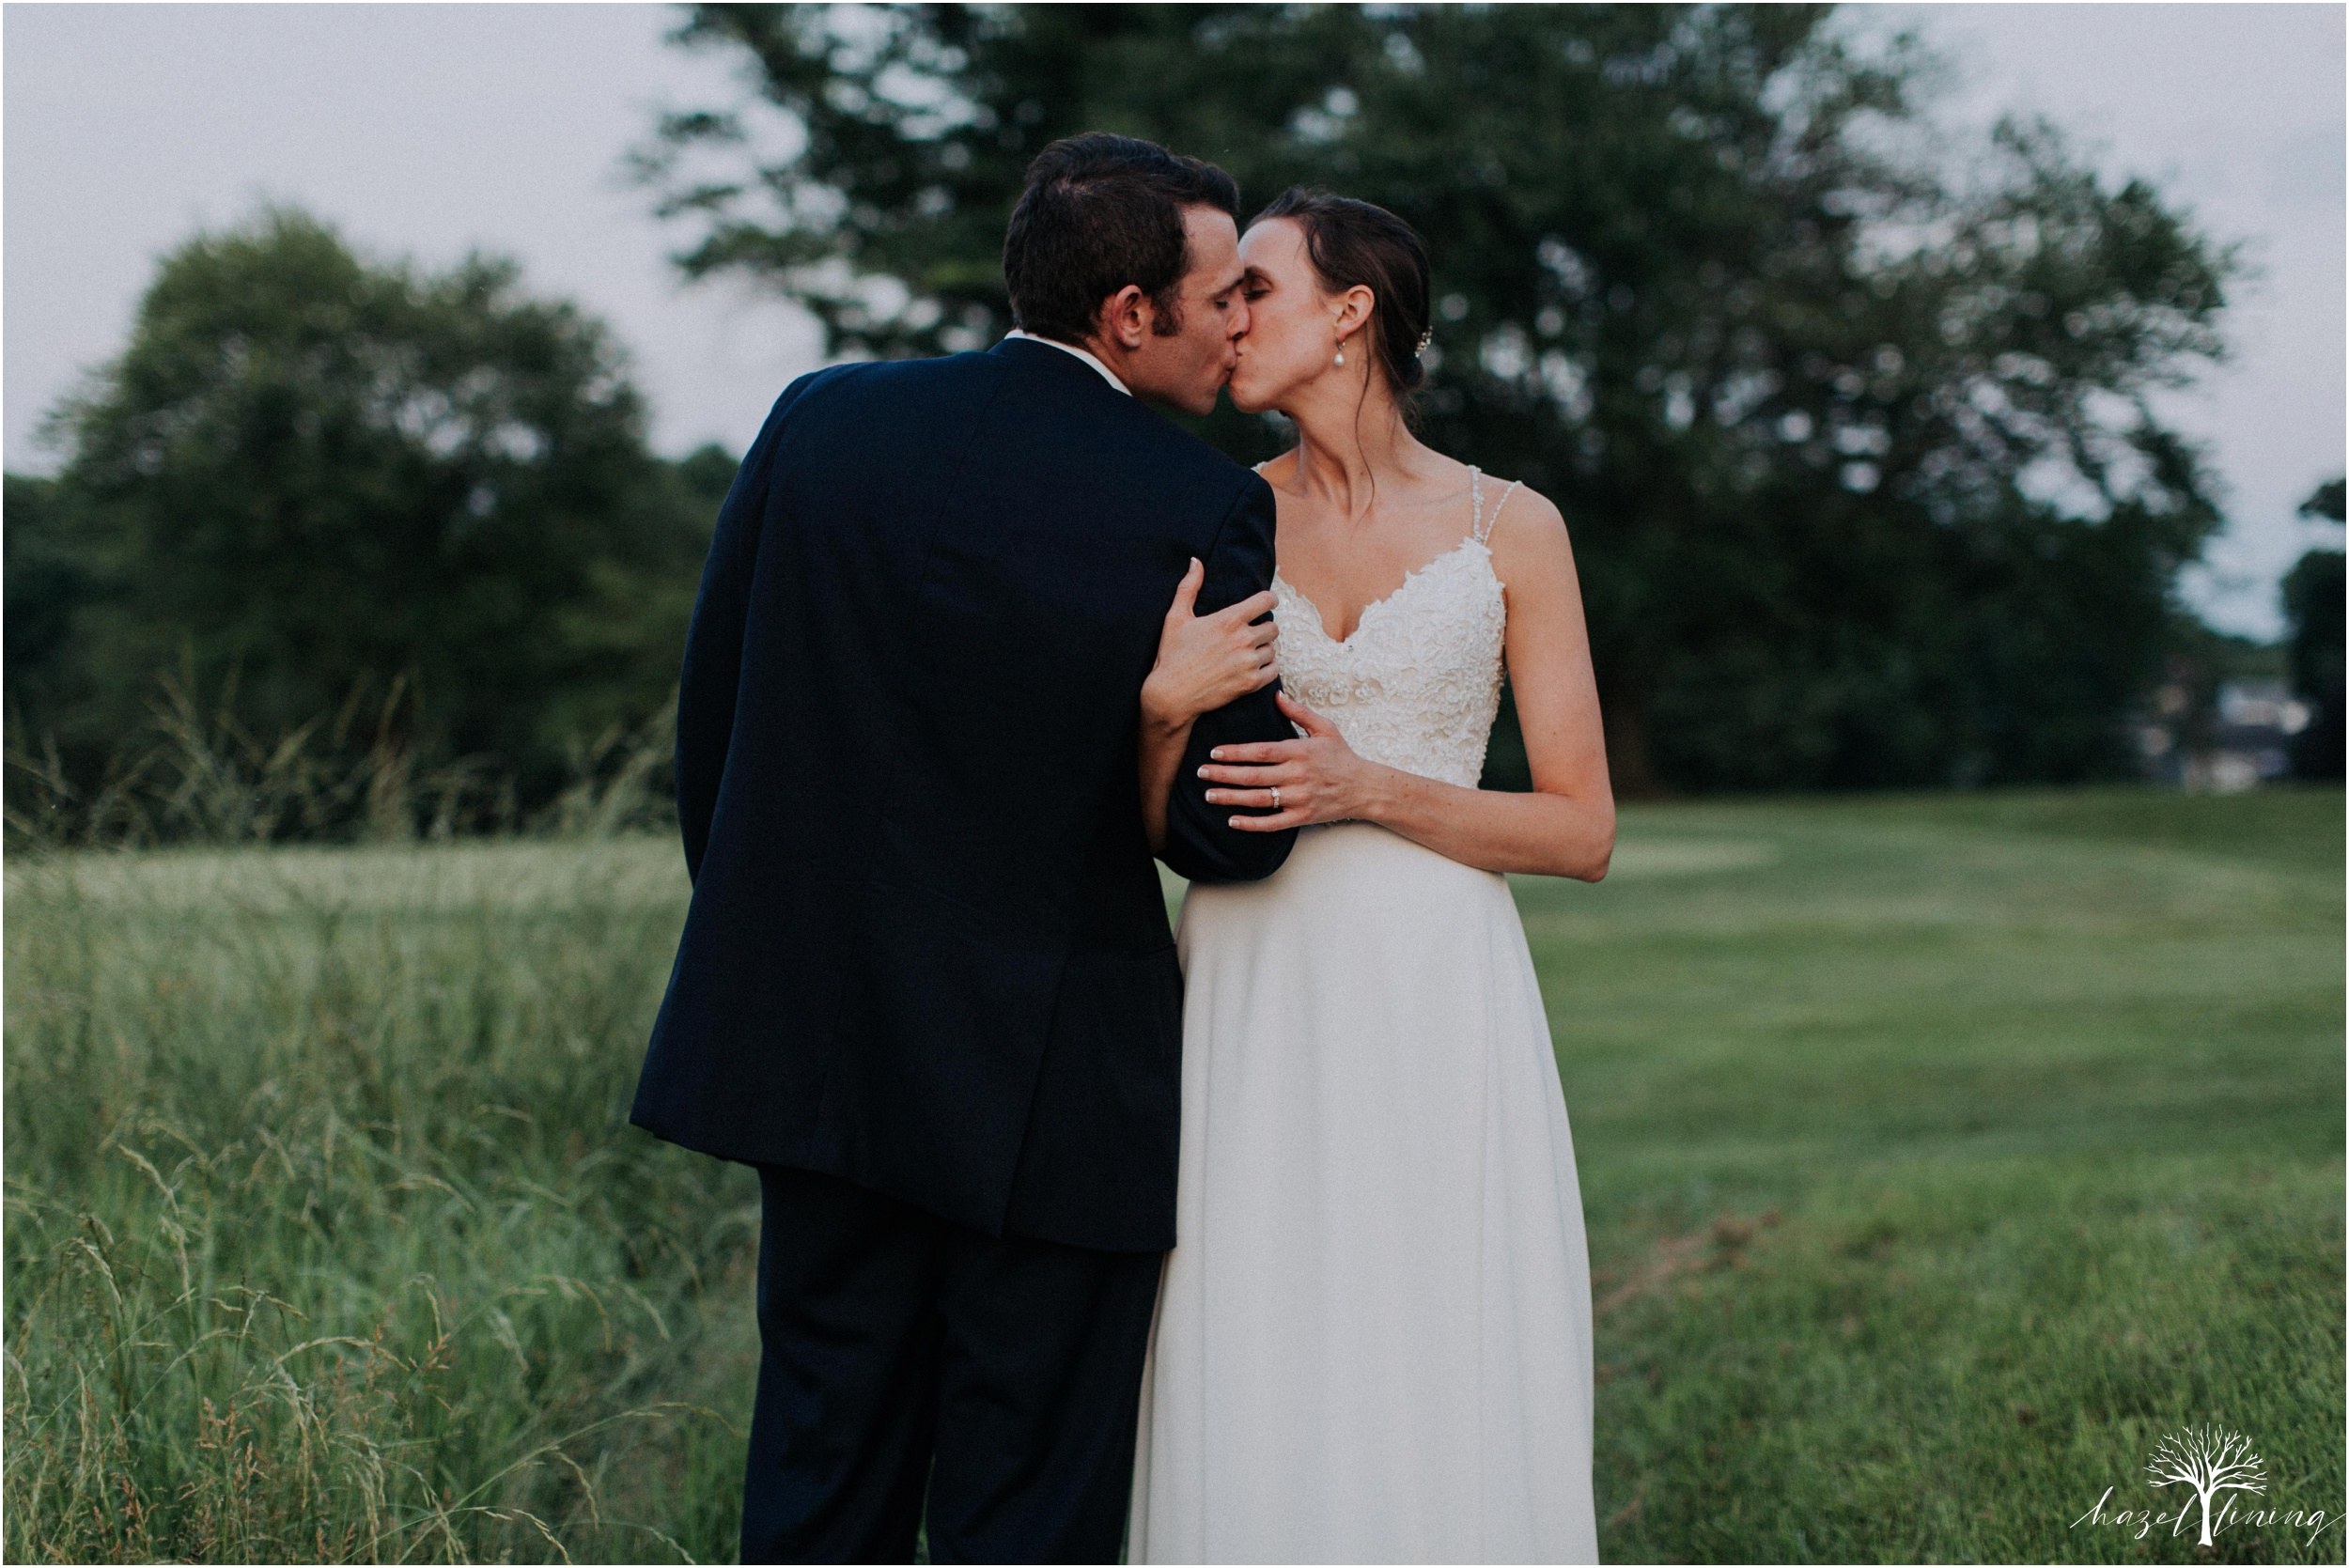 hazel-lining-travel-wedding-elopement-photography_0175.jpg